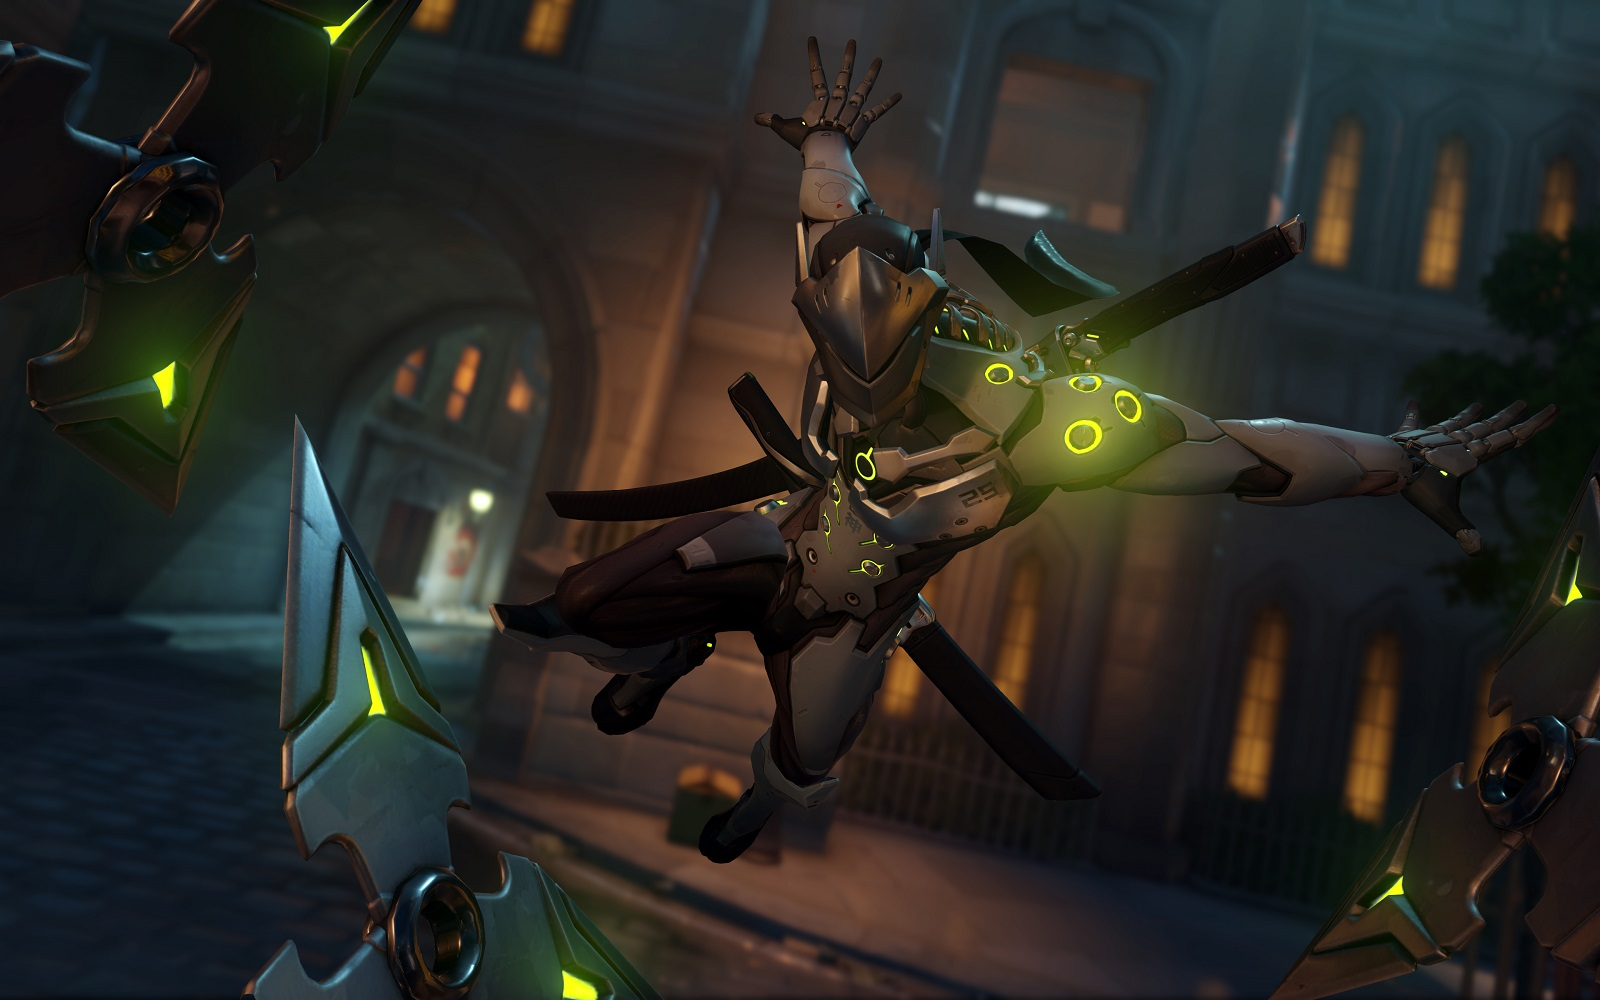 Genji throwing shurikens in Overwatch on King's Row